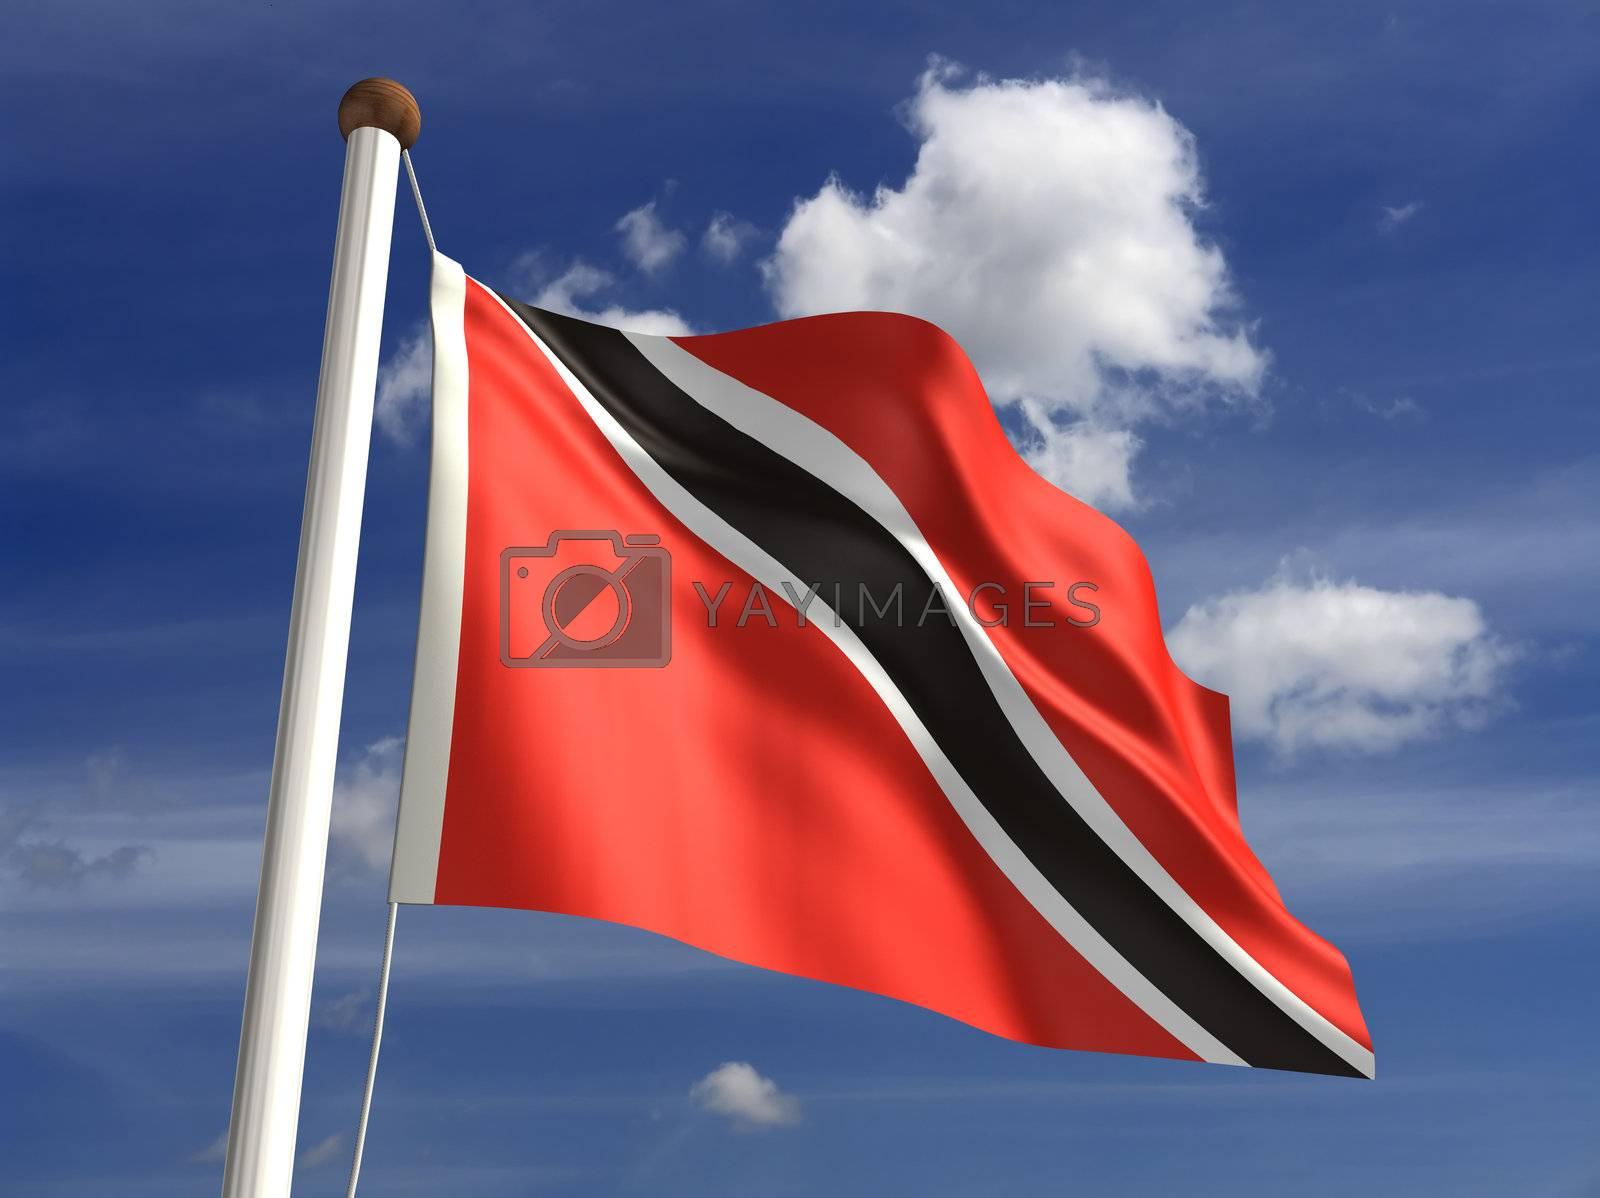 Trinidad and Tobago flag by selensergen